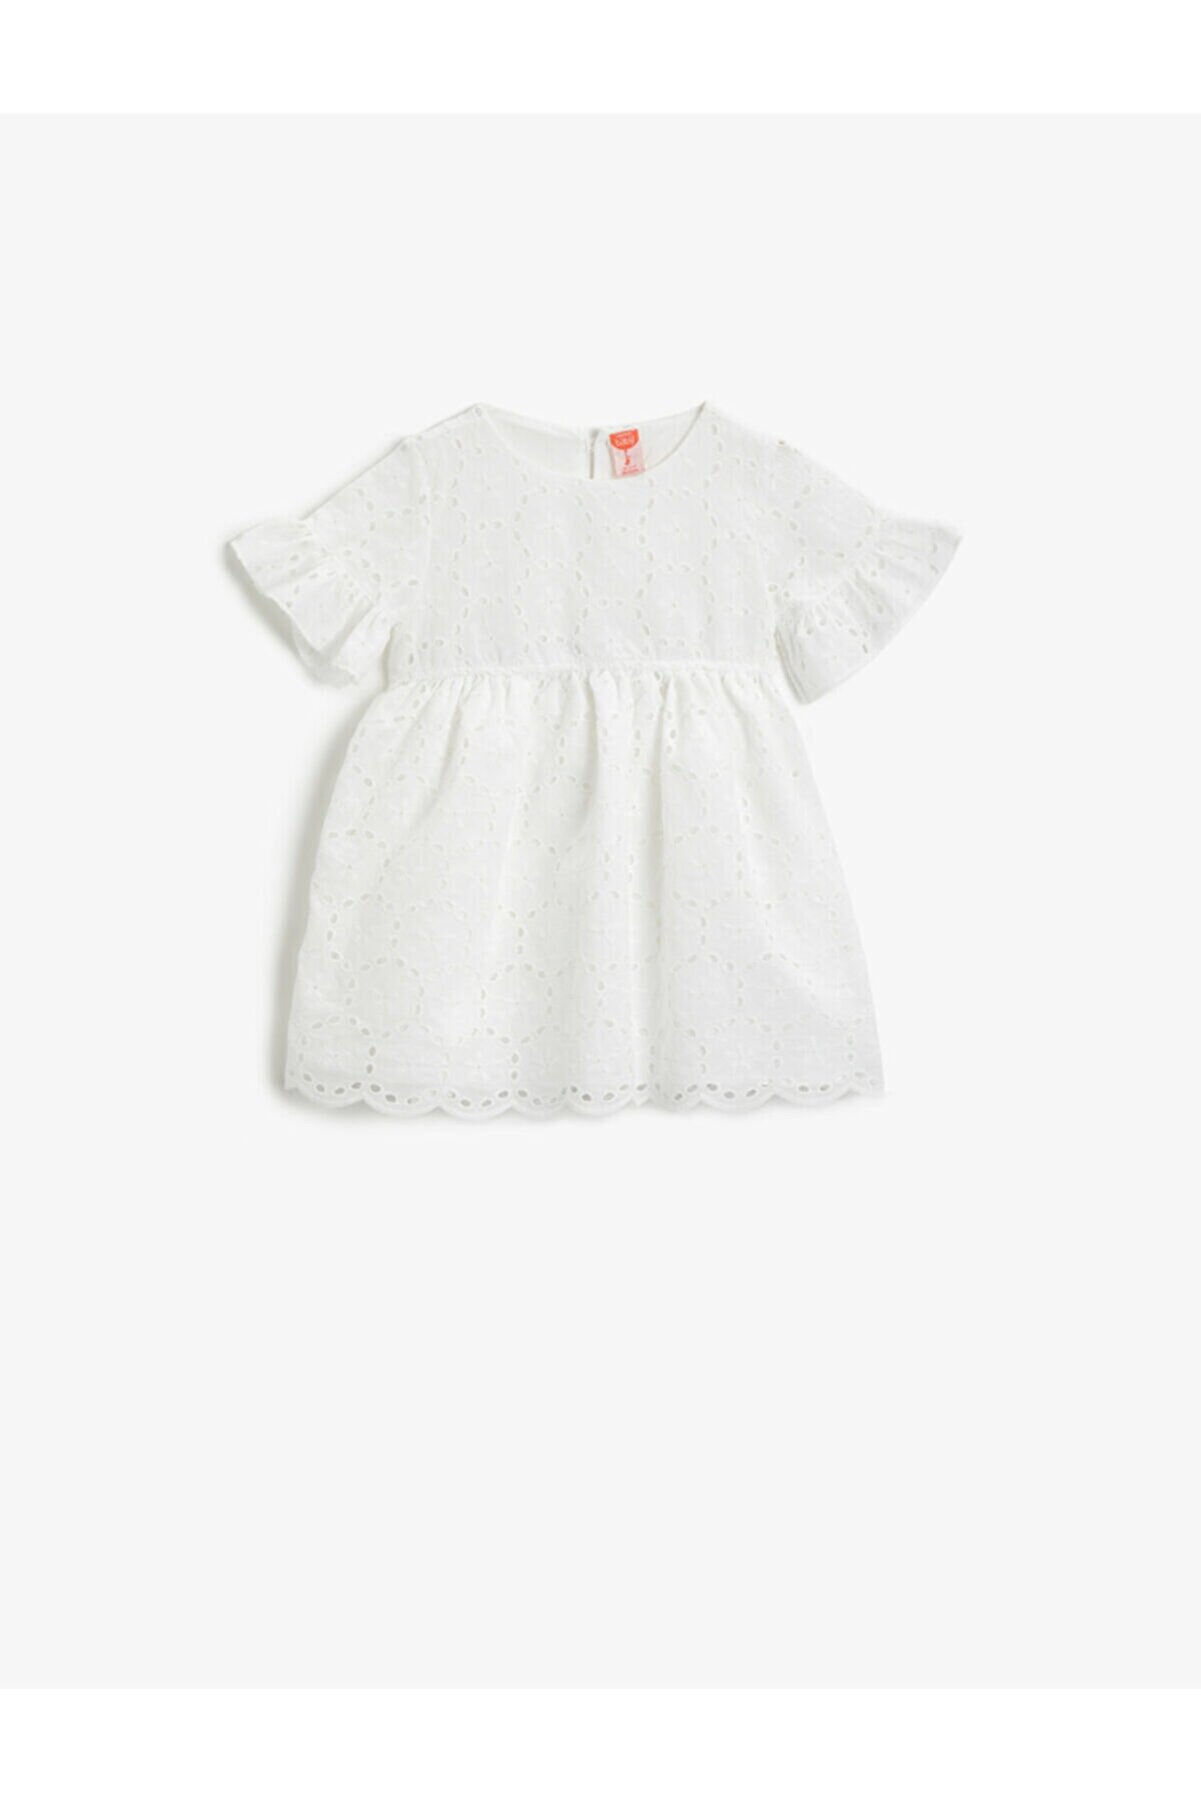 Koton Kız Bebek Ekru Dantel Elbise